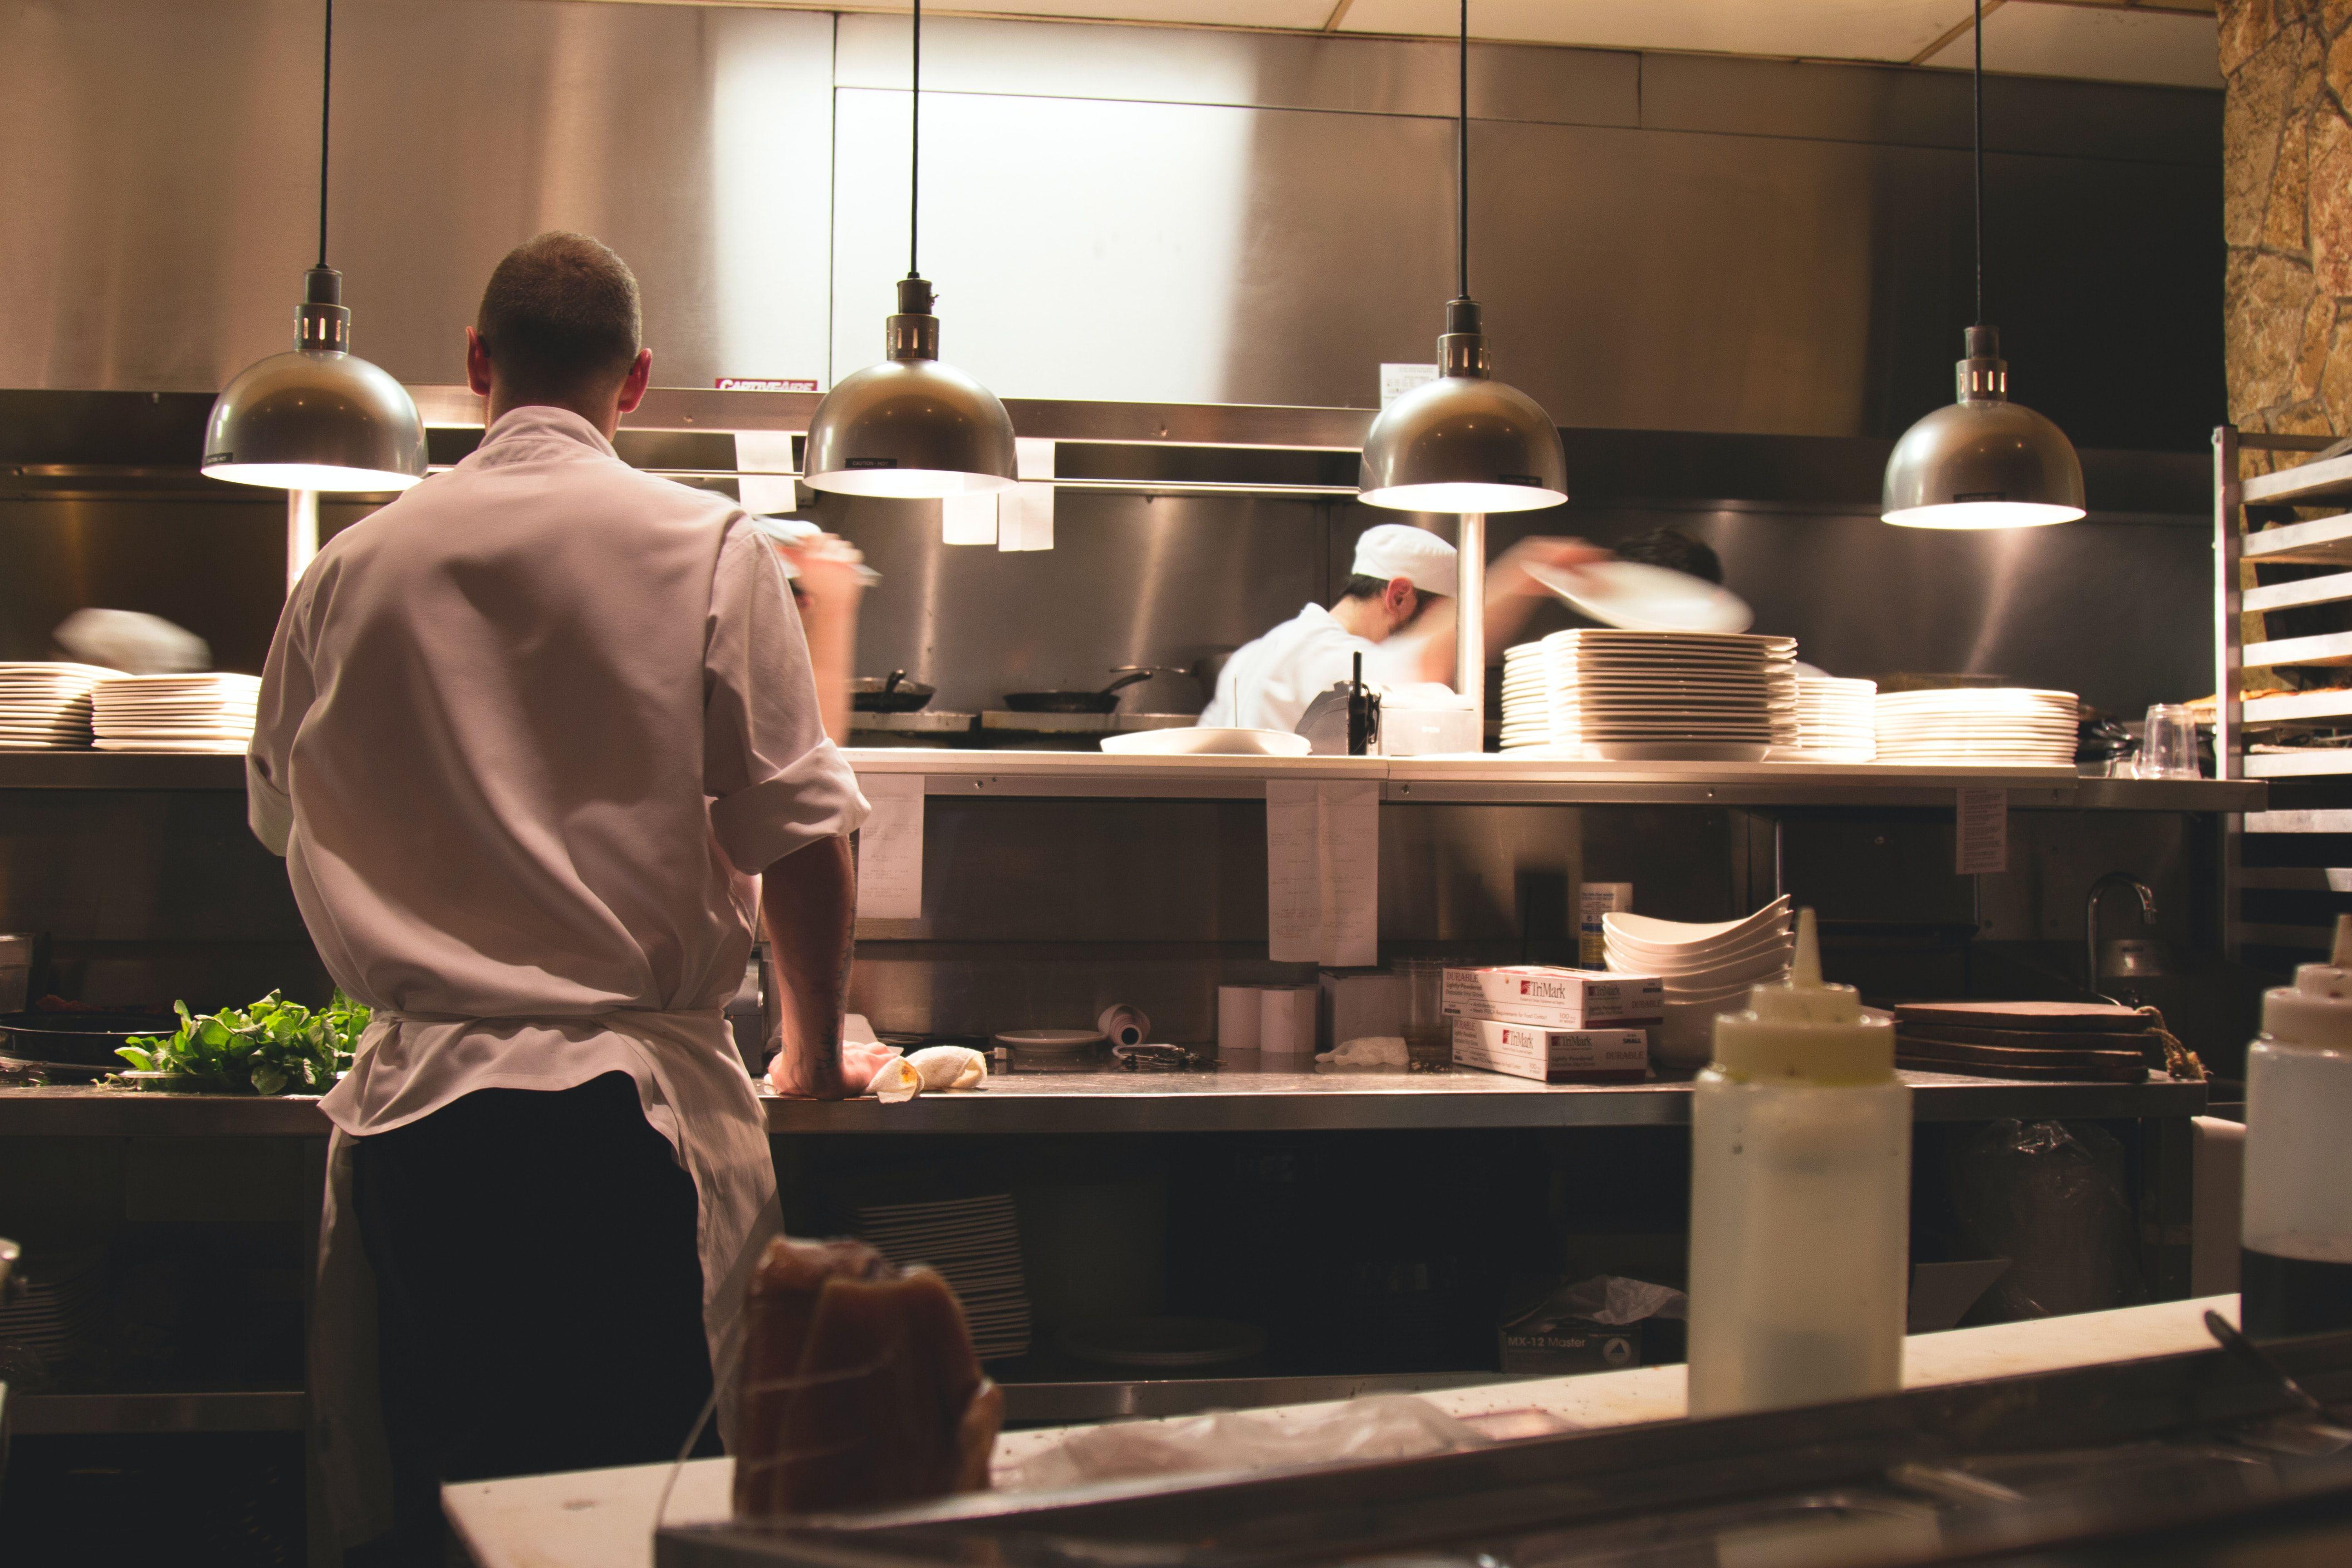 cuisinier en chemise blanche